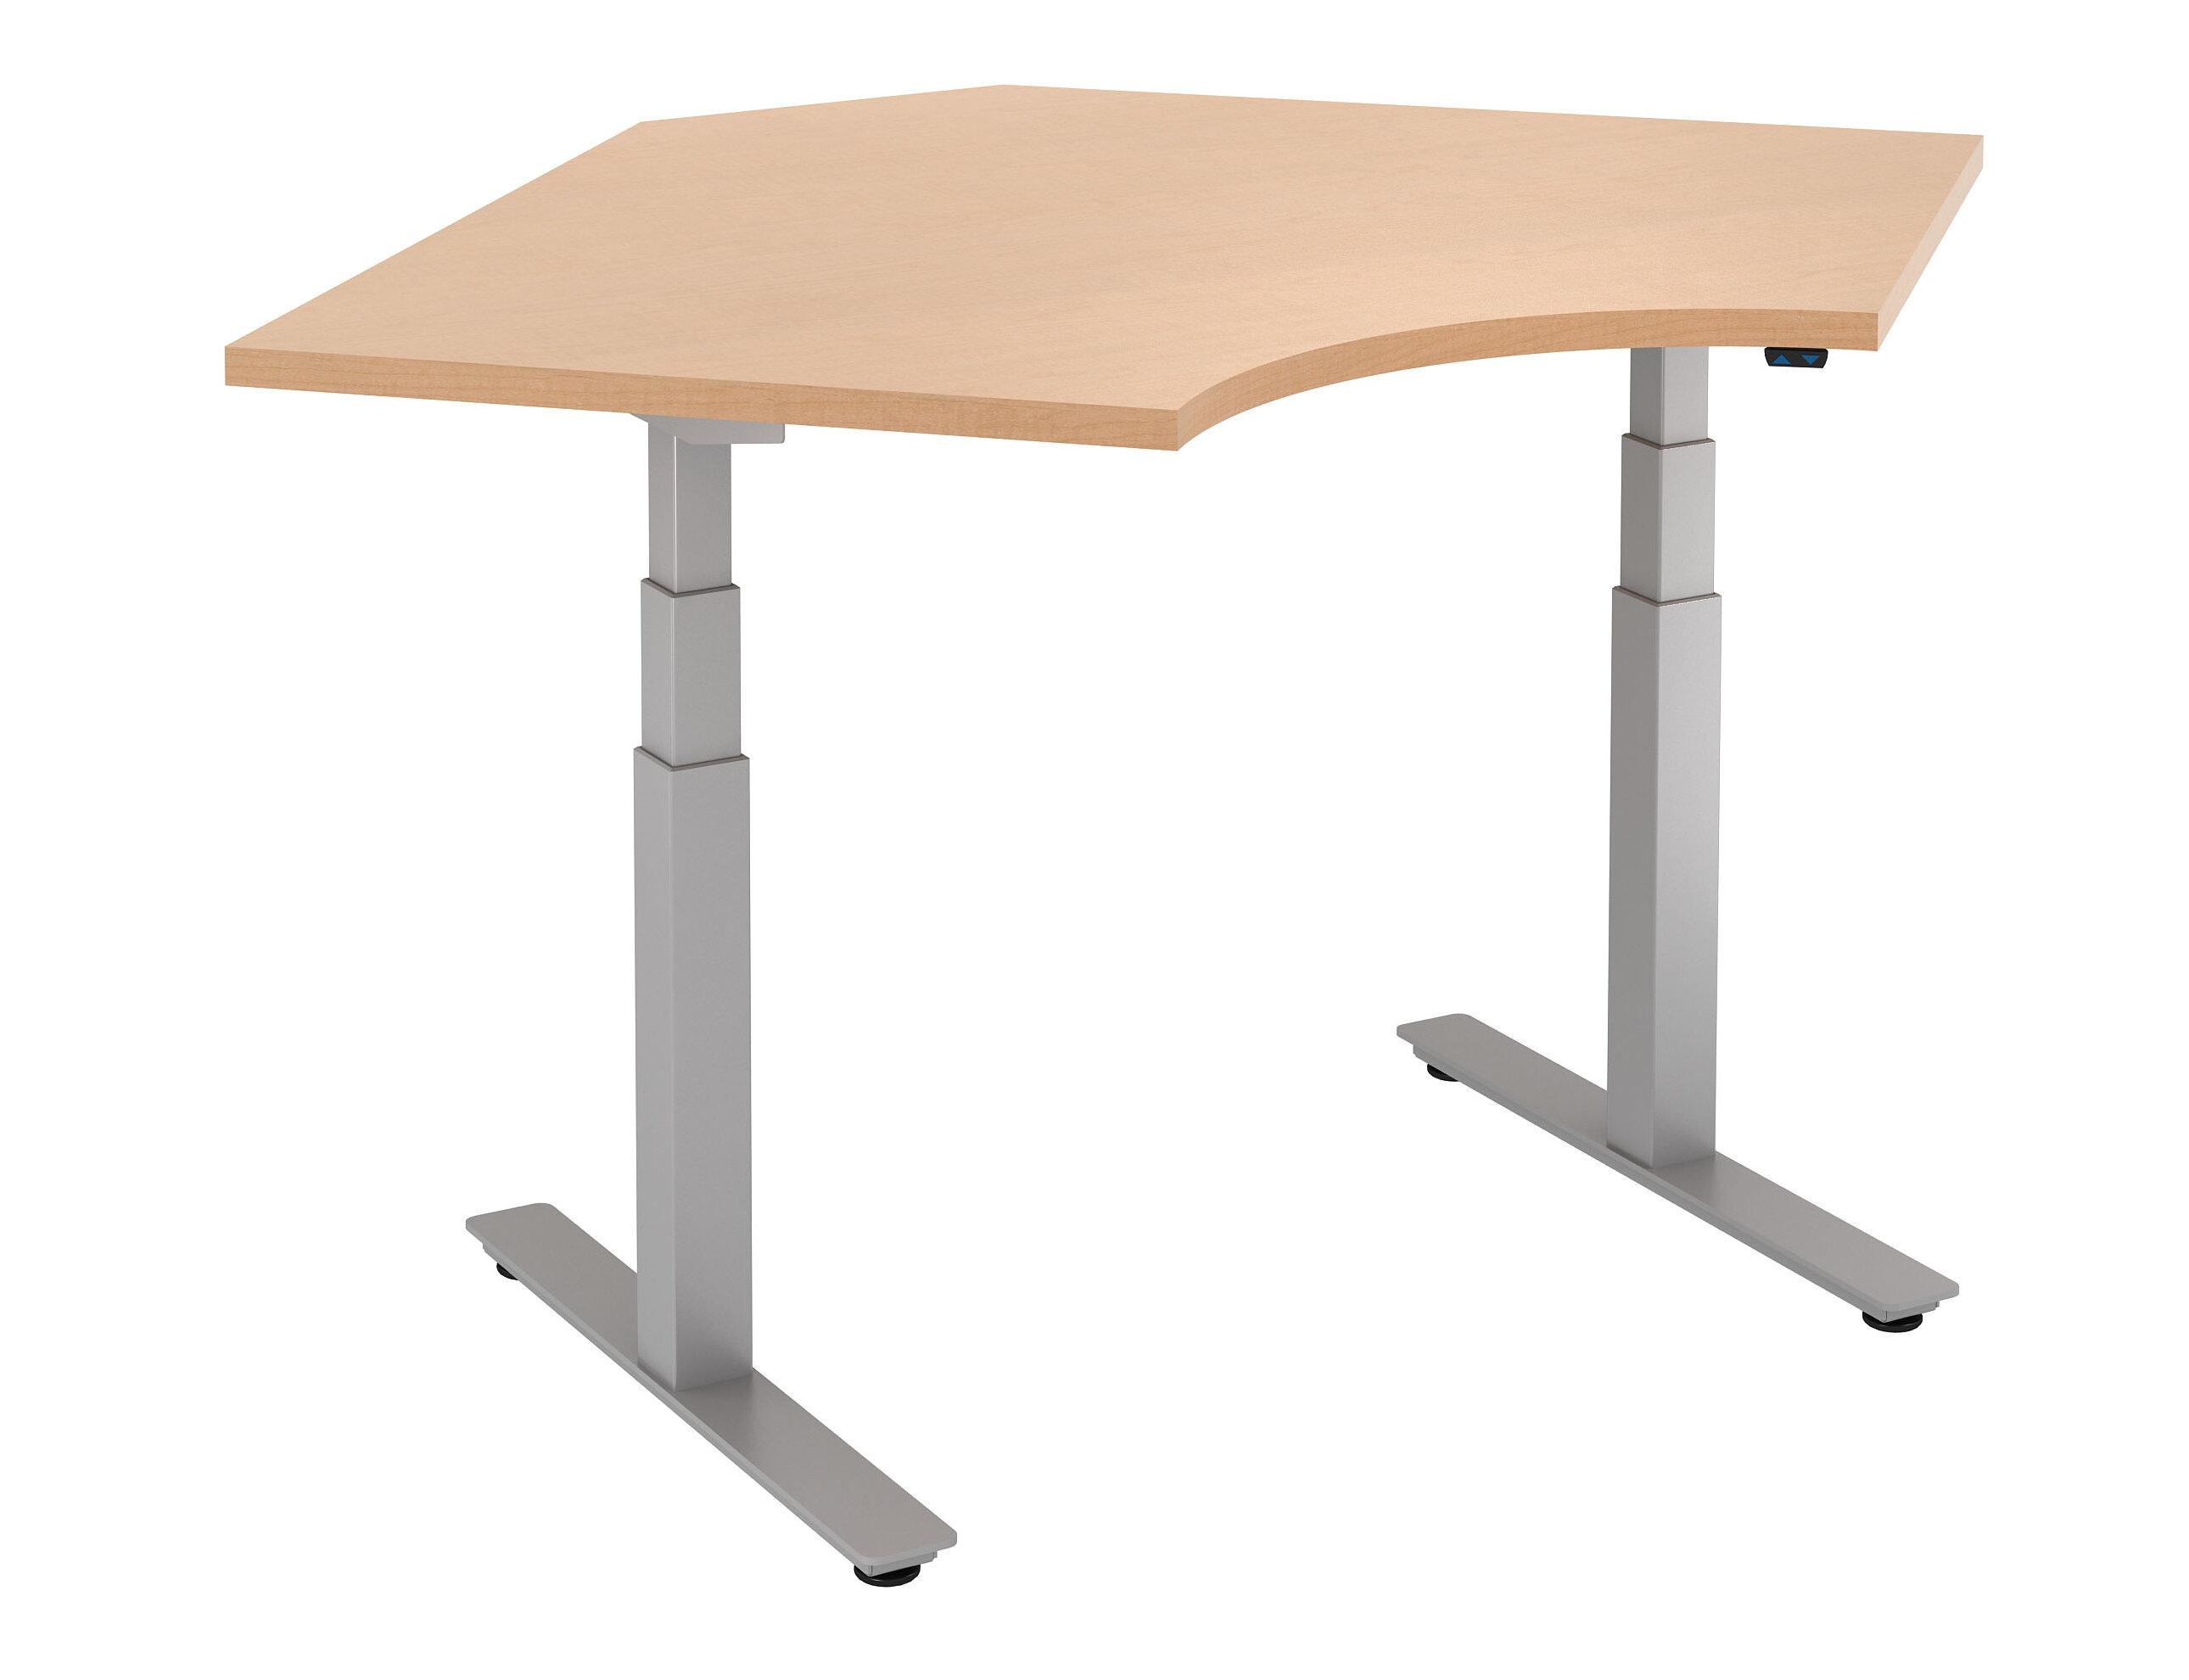 Trendway Curved Corner Height Adjustable Standing Table